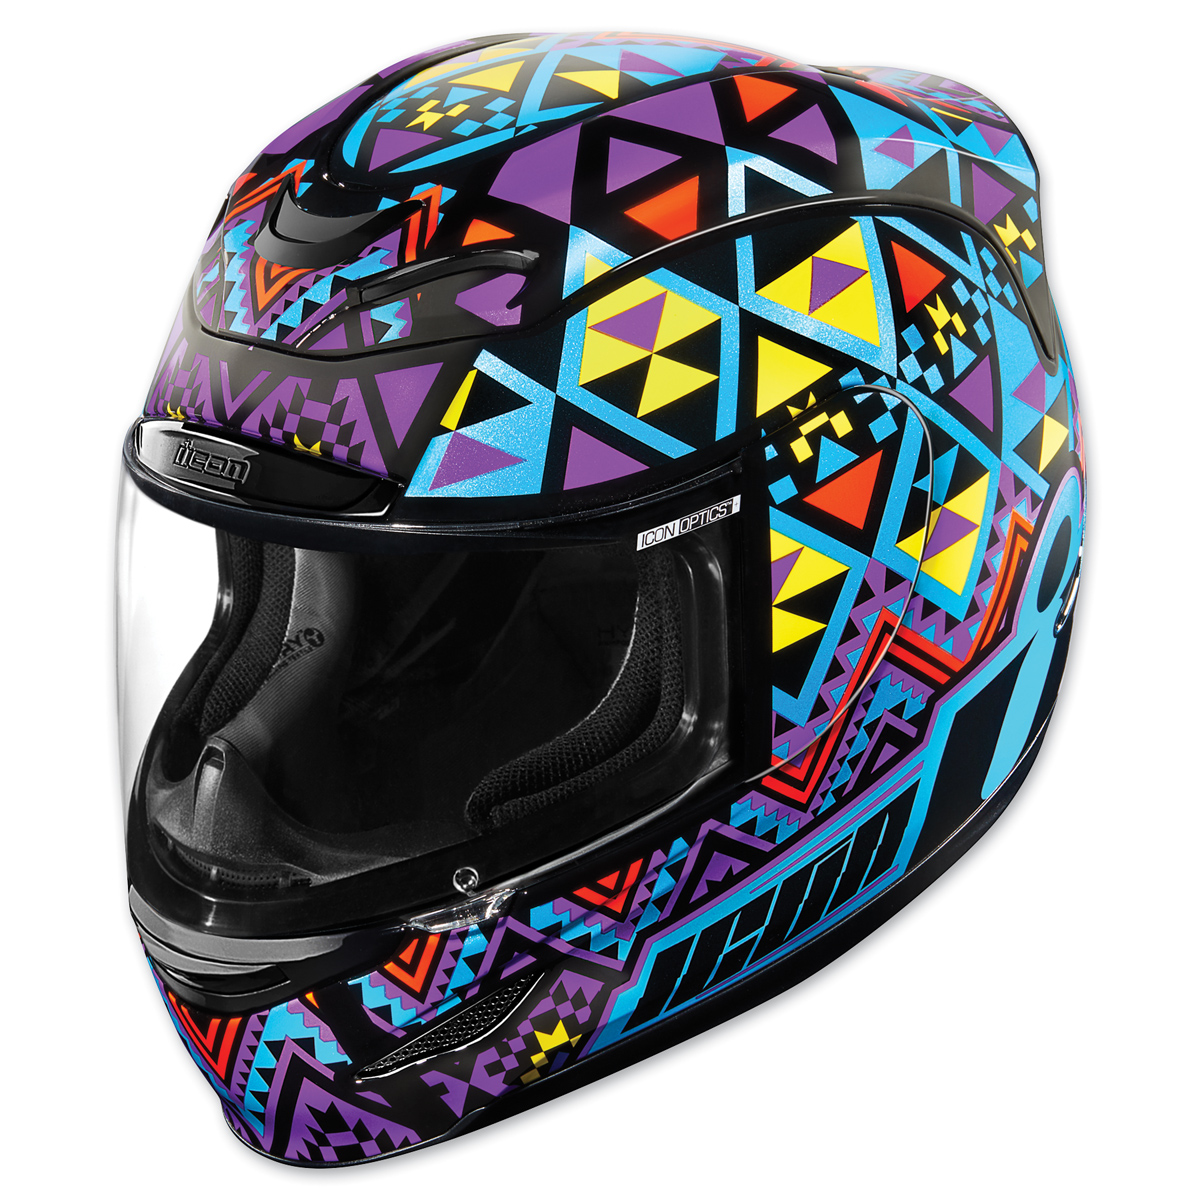 ICON Airmada Georacer Full Face Helmet